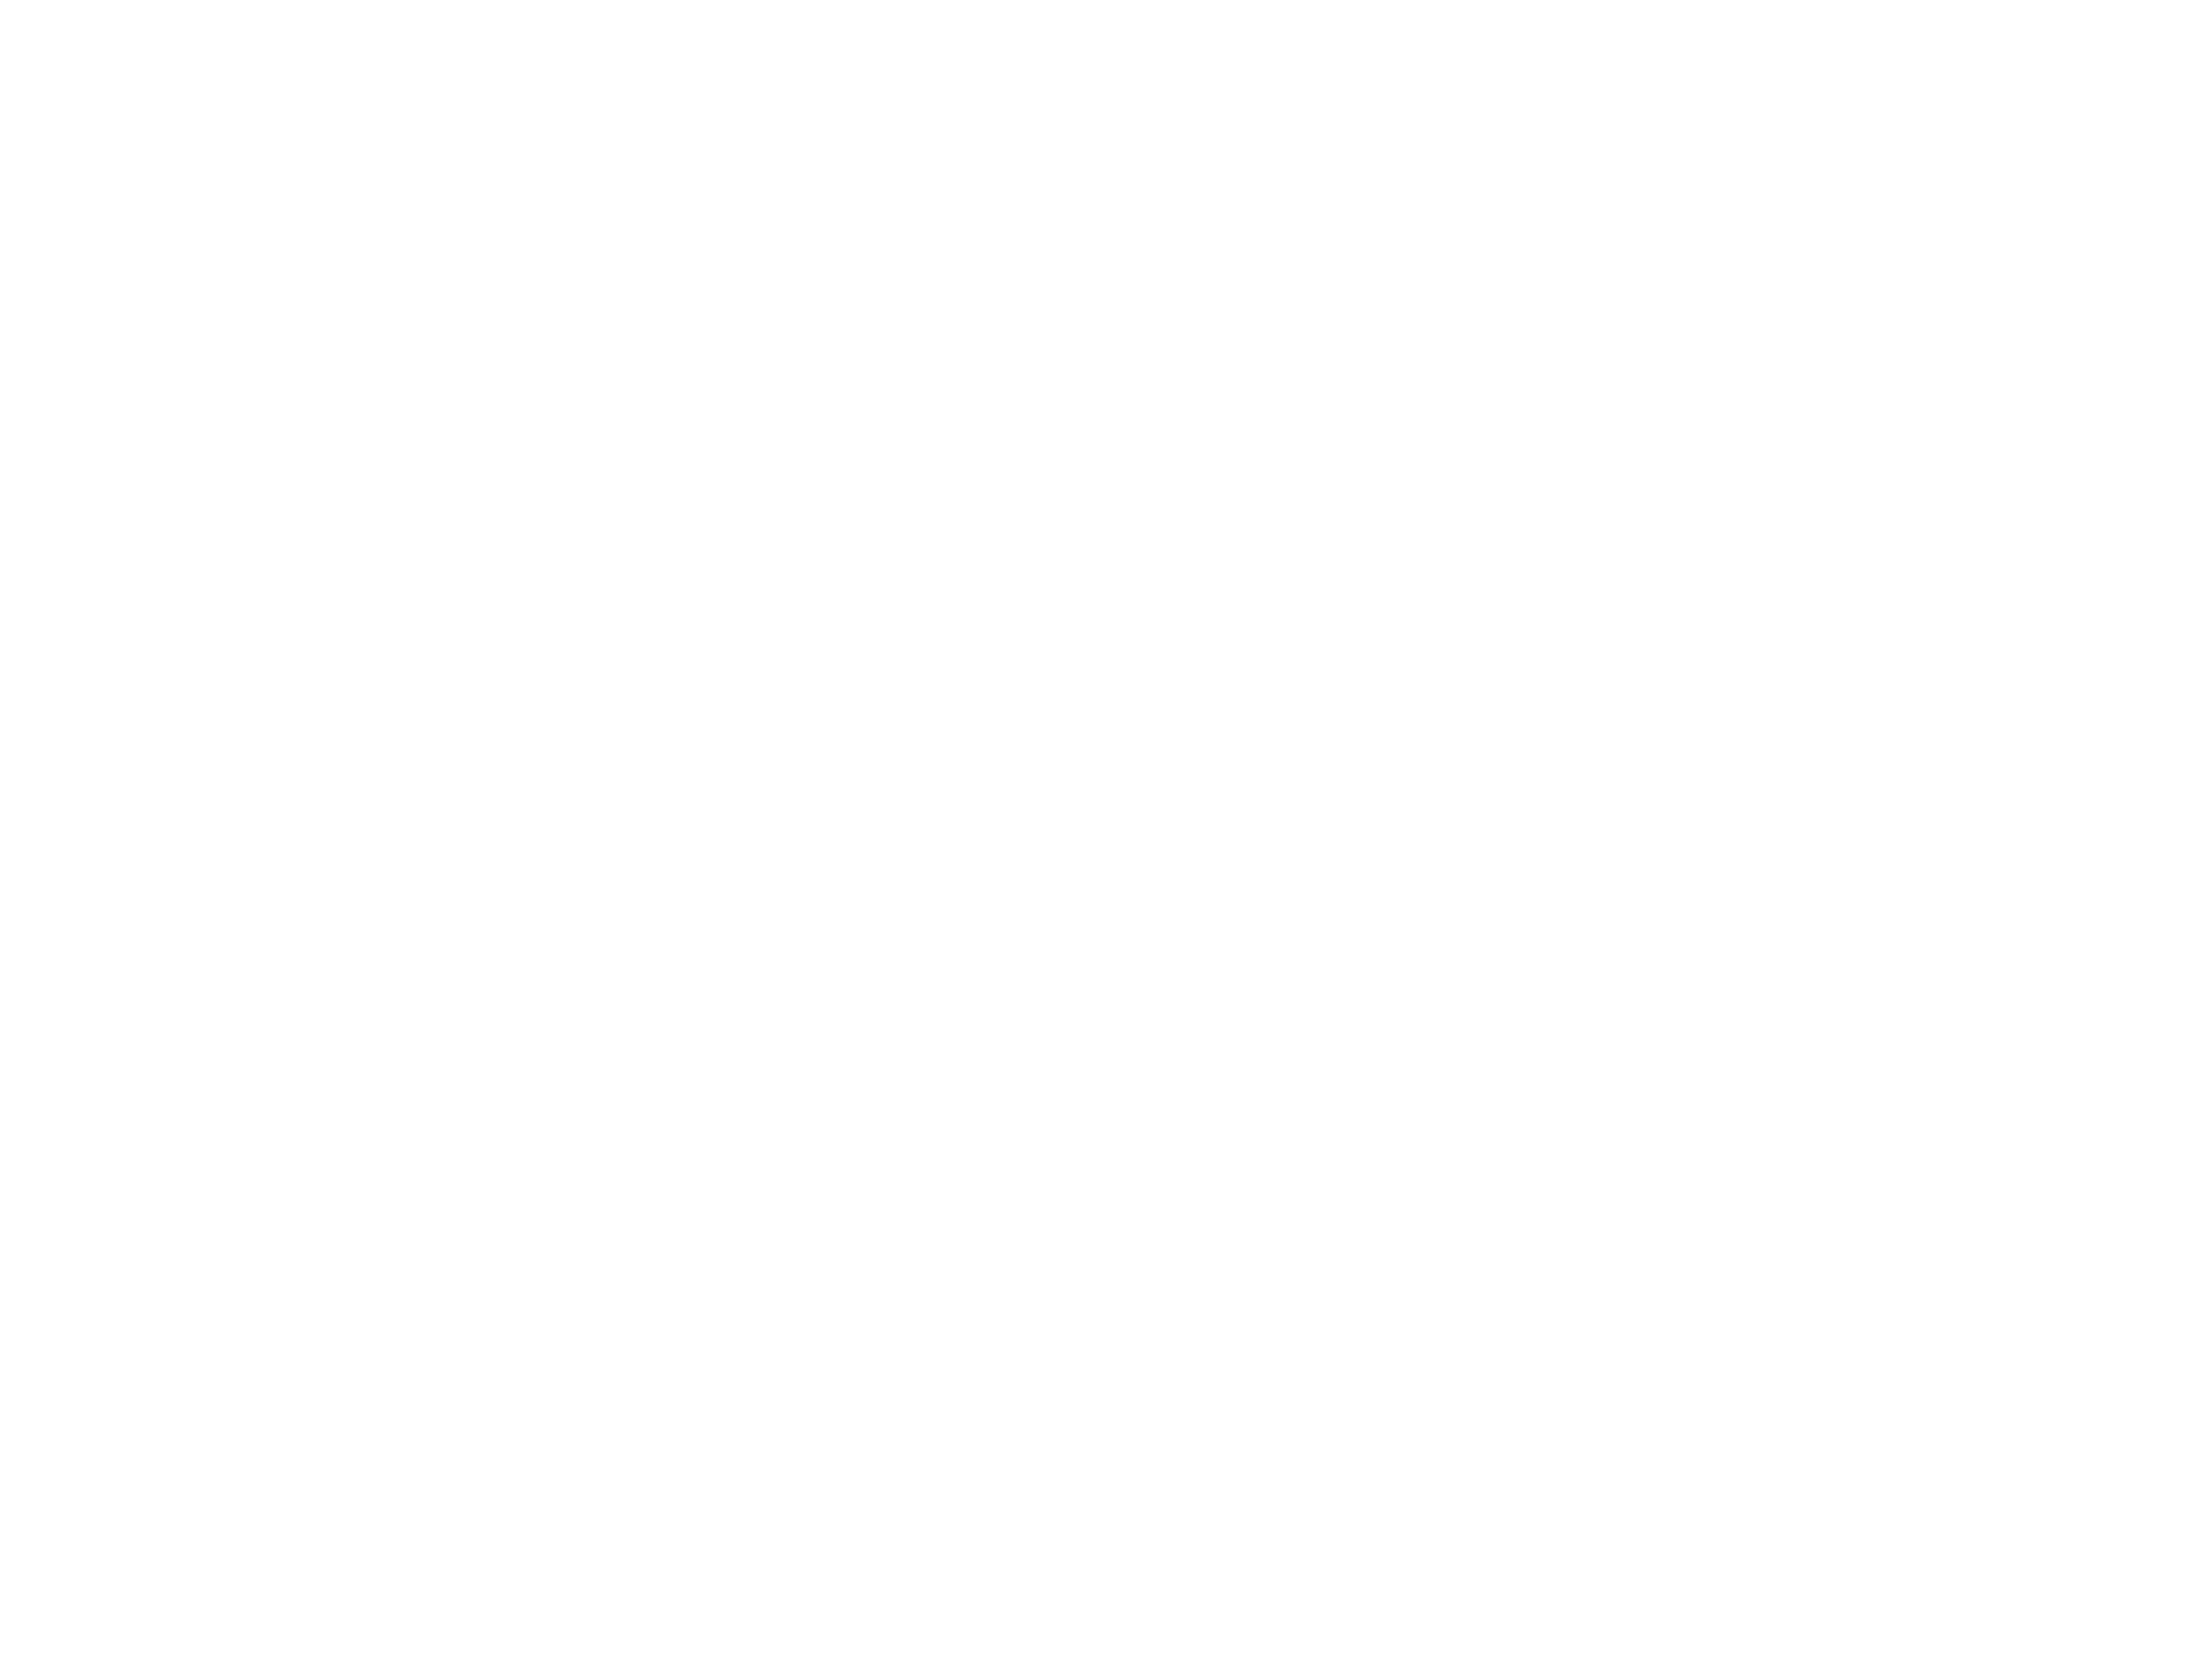 selectvisa-pte04